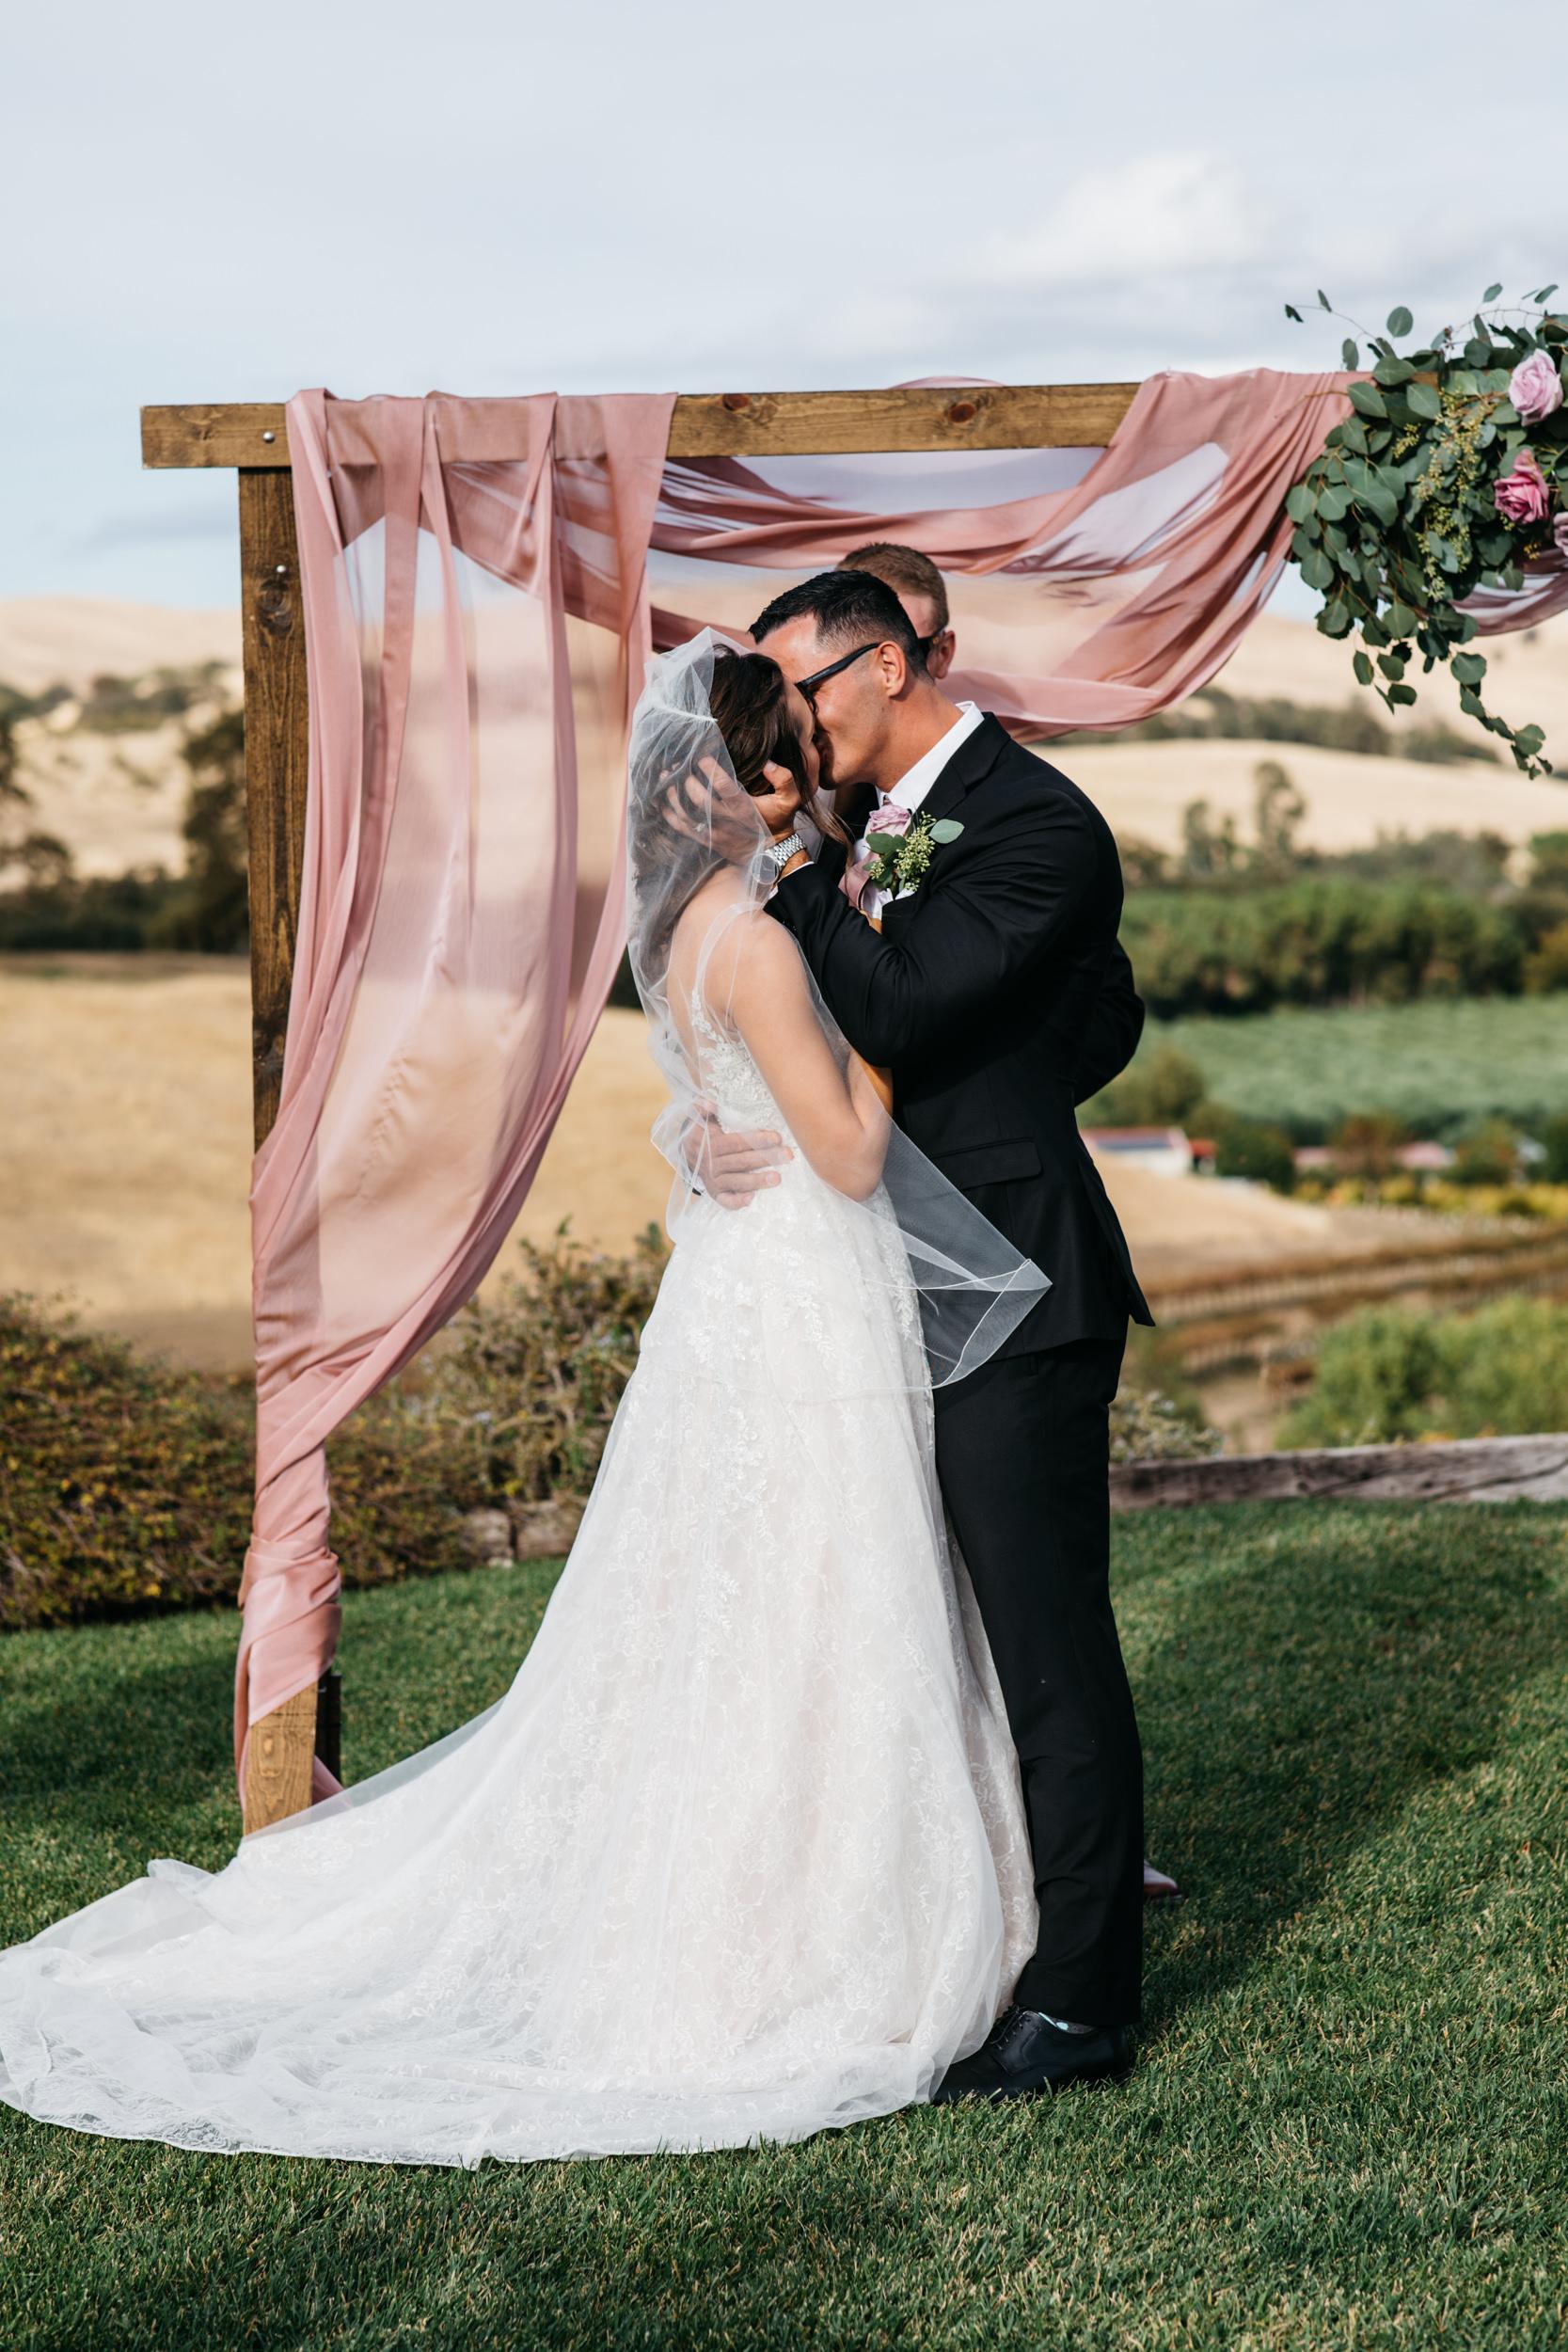 Nazariy_Tanya_Wedding-68.jpg